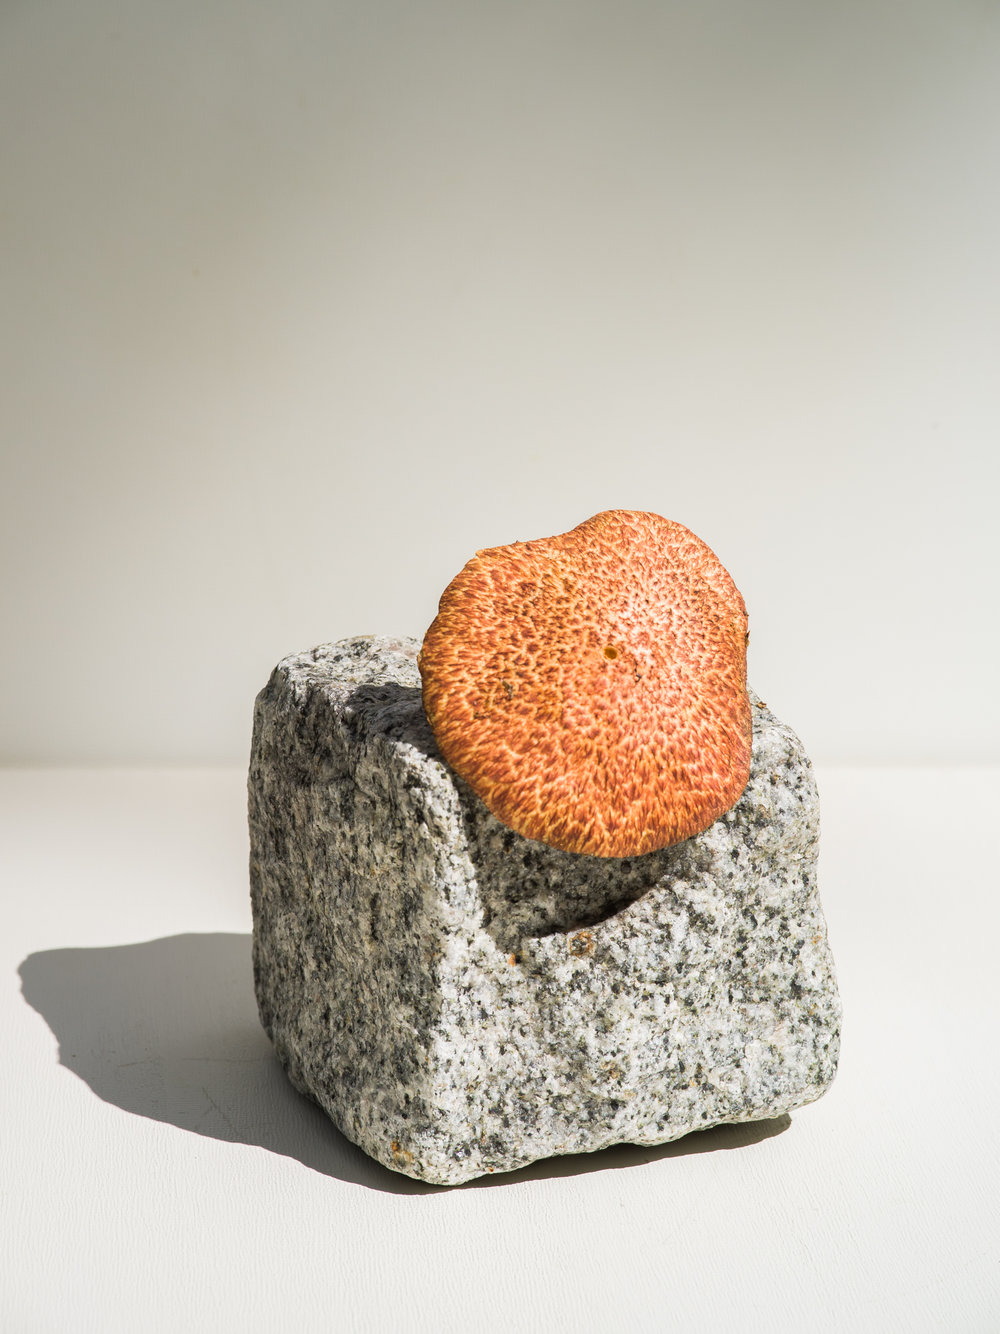 granite with mushrooms-1-2.jpg